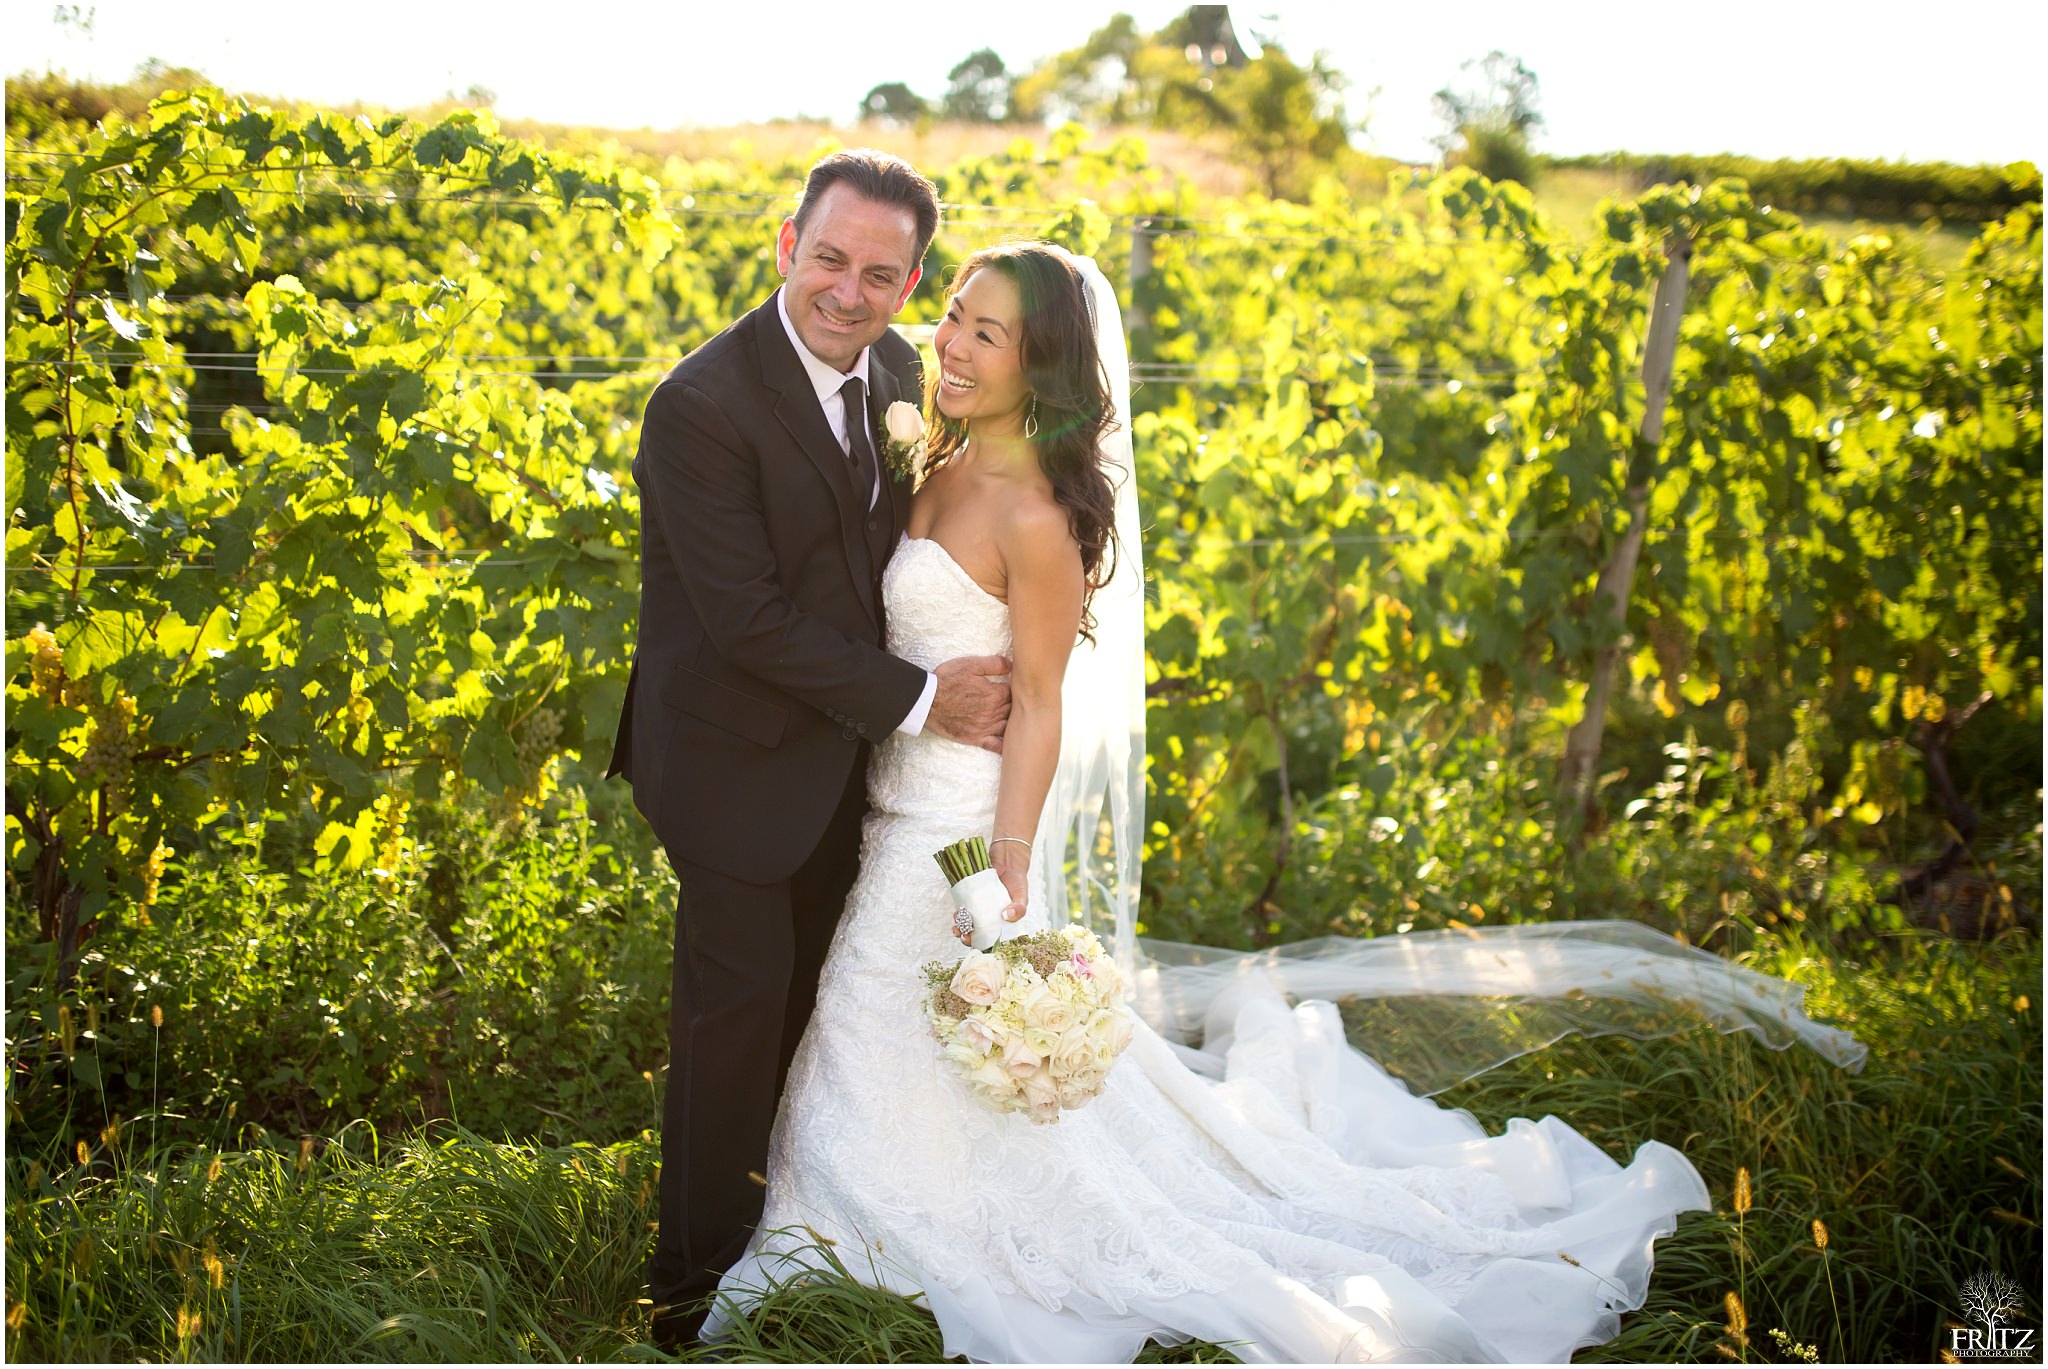 Hopkins Vineyard Wedding Photos 6